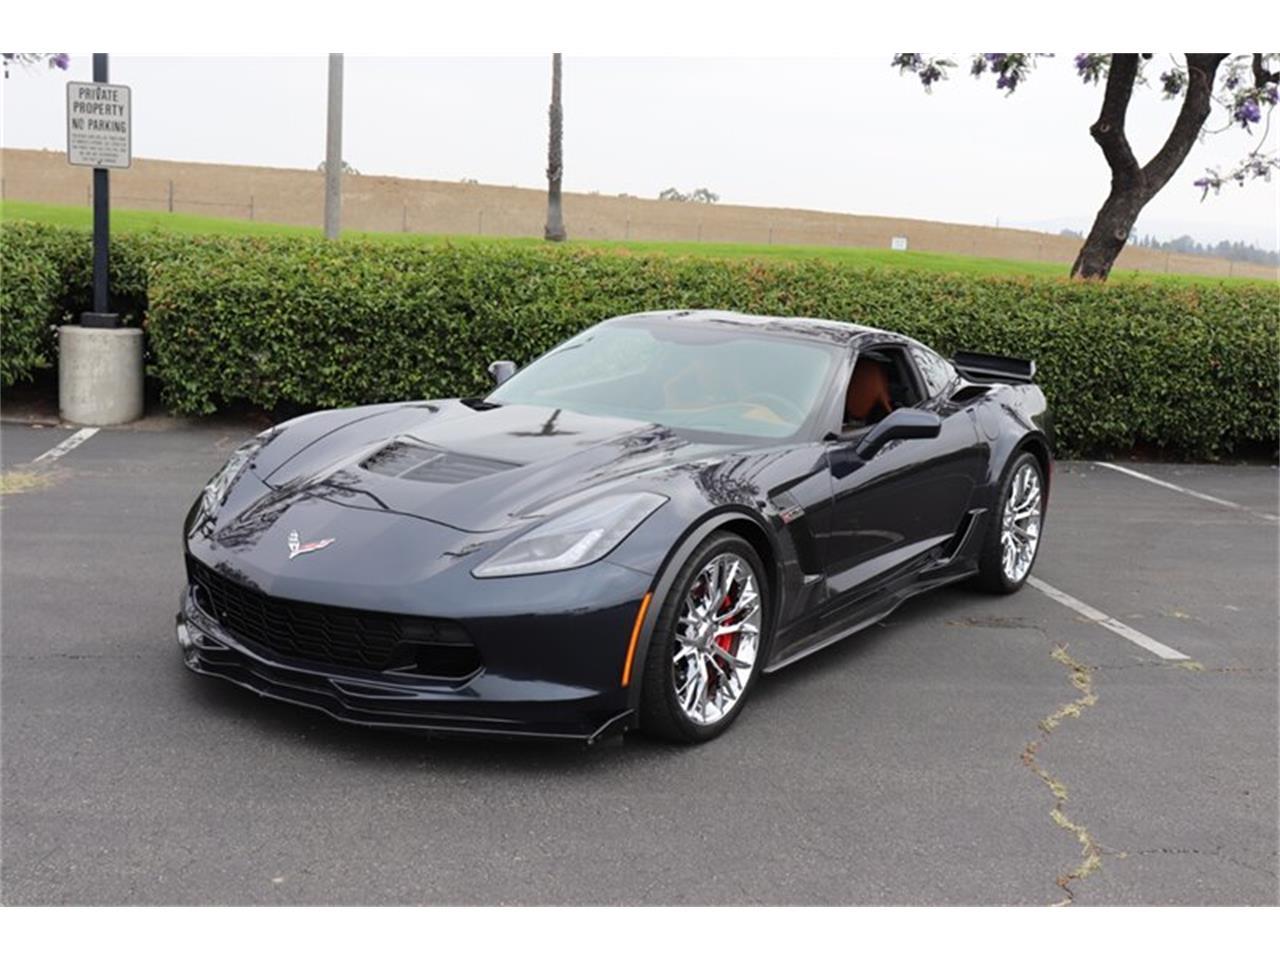 Large Picture of 2015 Corvette Z06 located in California - $59,995.00 - QFLK